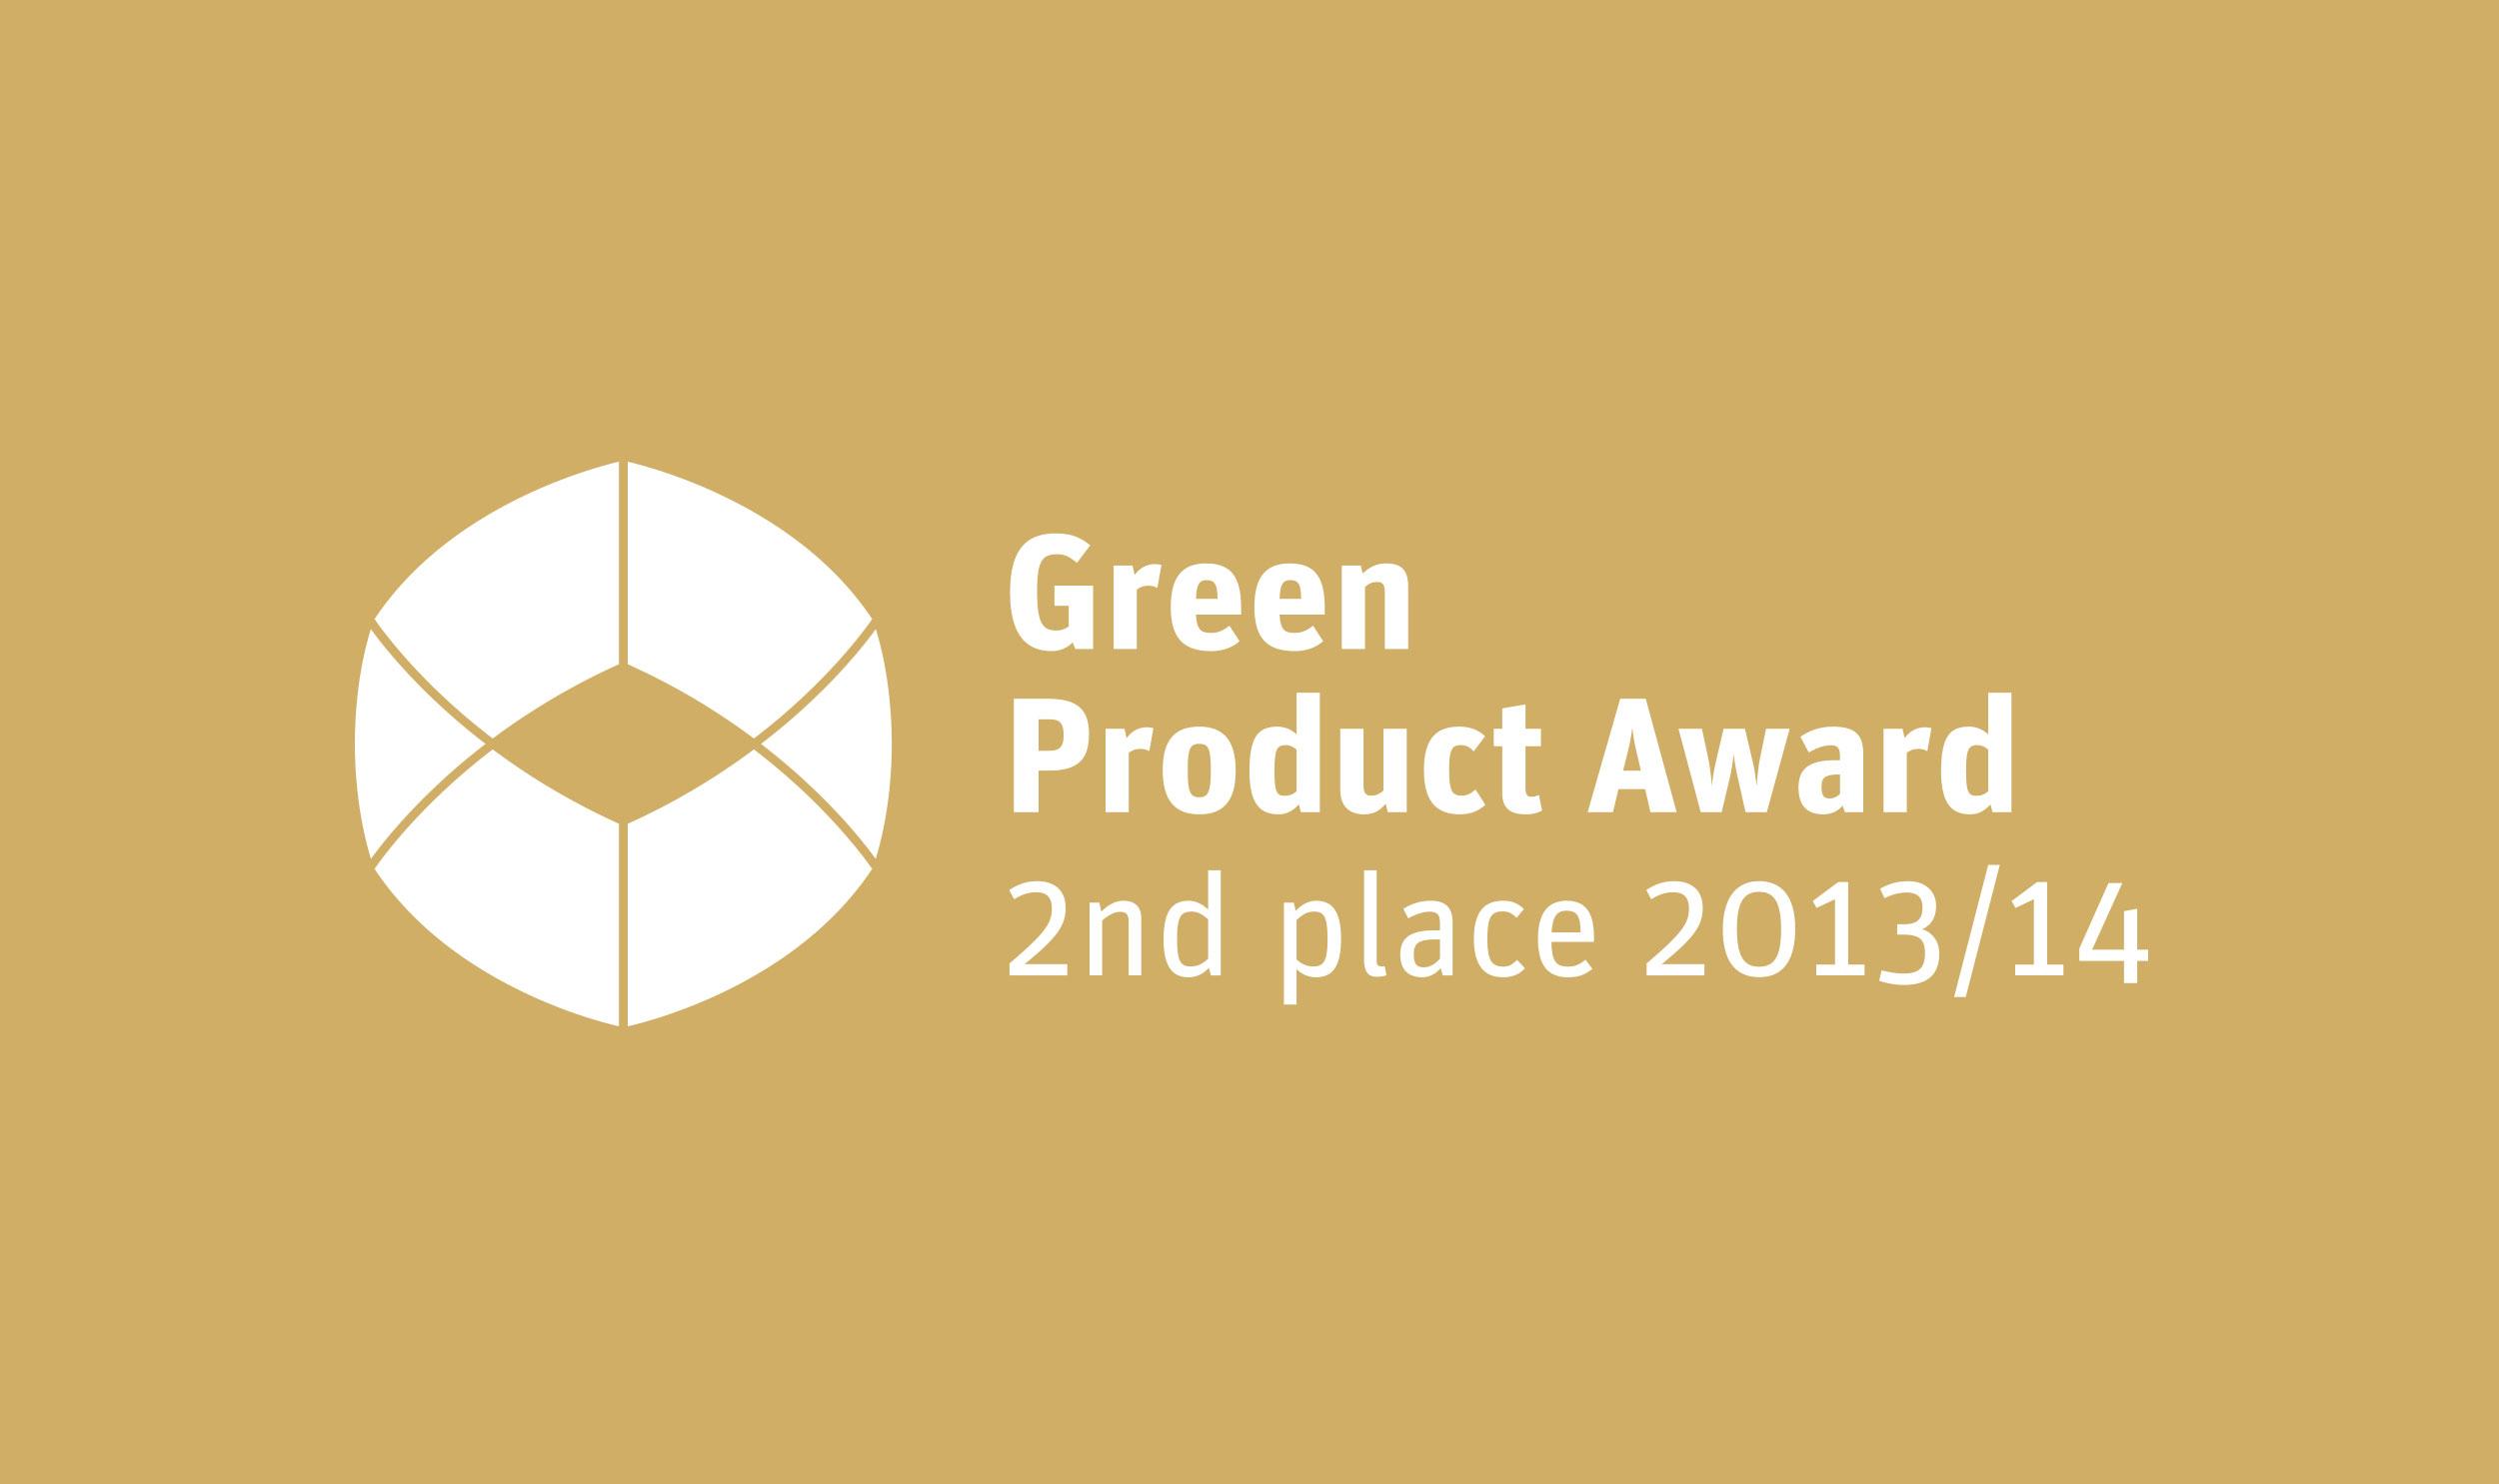 AWARD_Green-Product-Award_2013_2nd